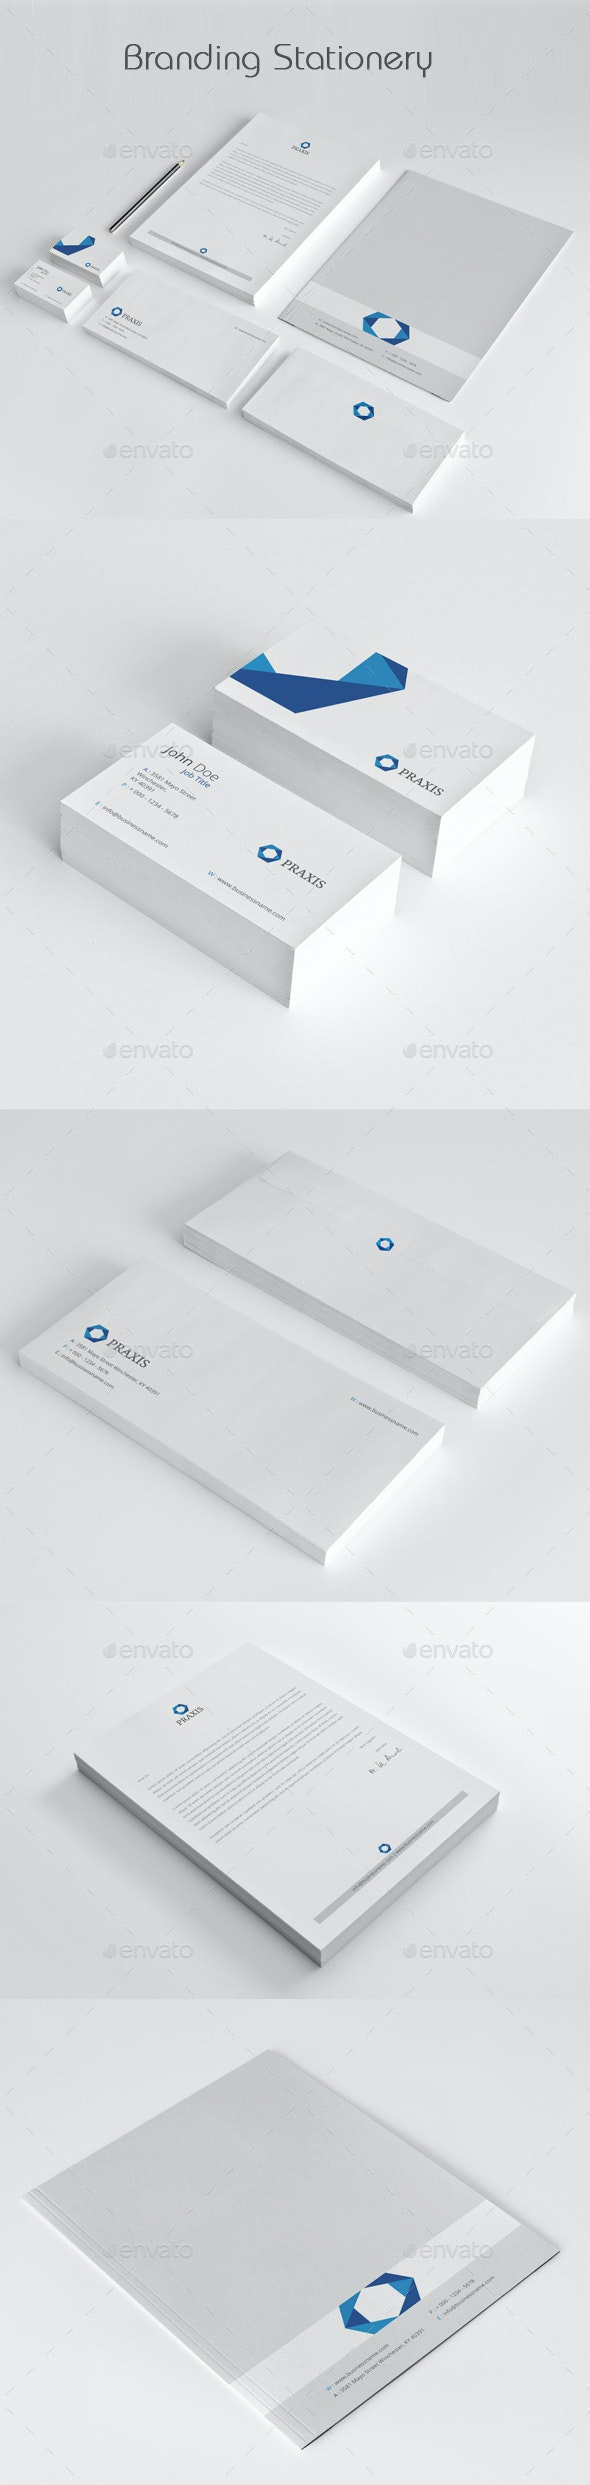 Branding Stationery - Stationery Print Templates